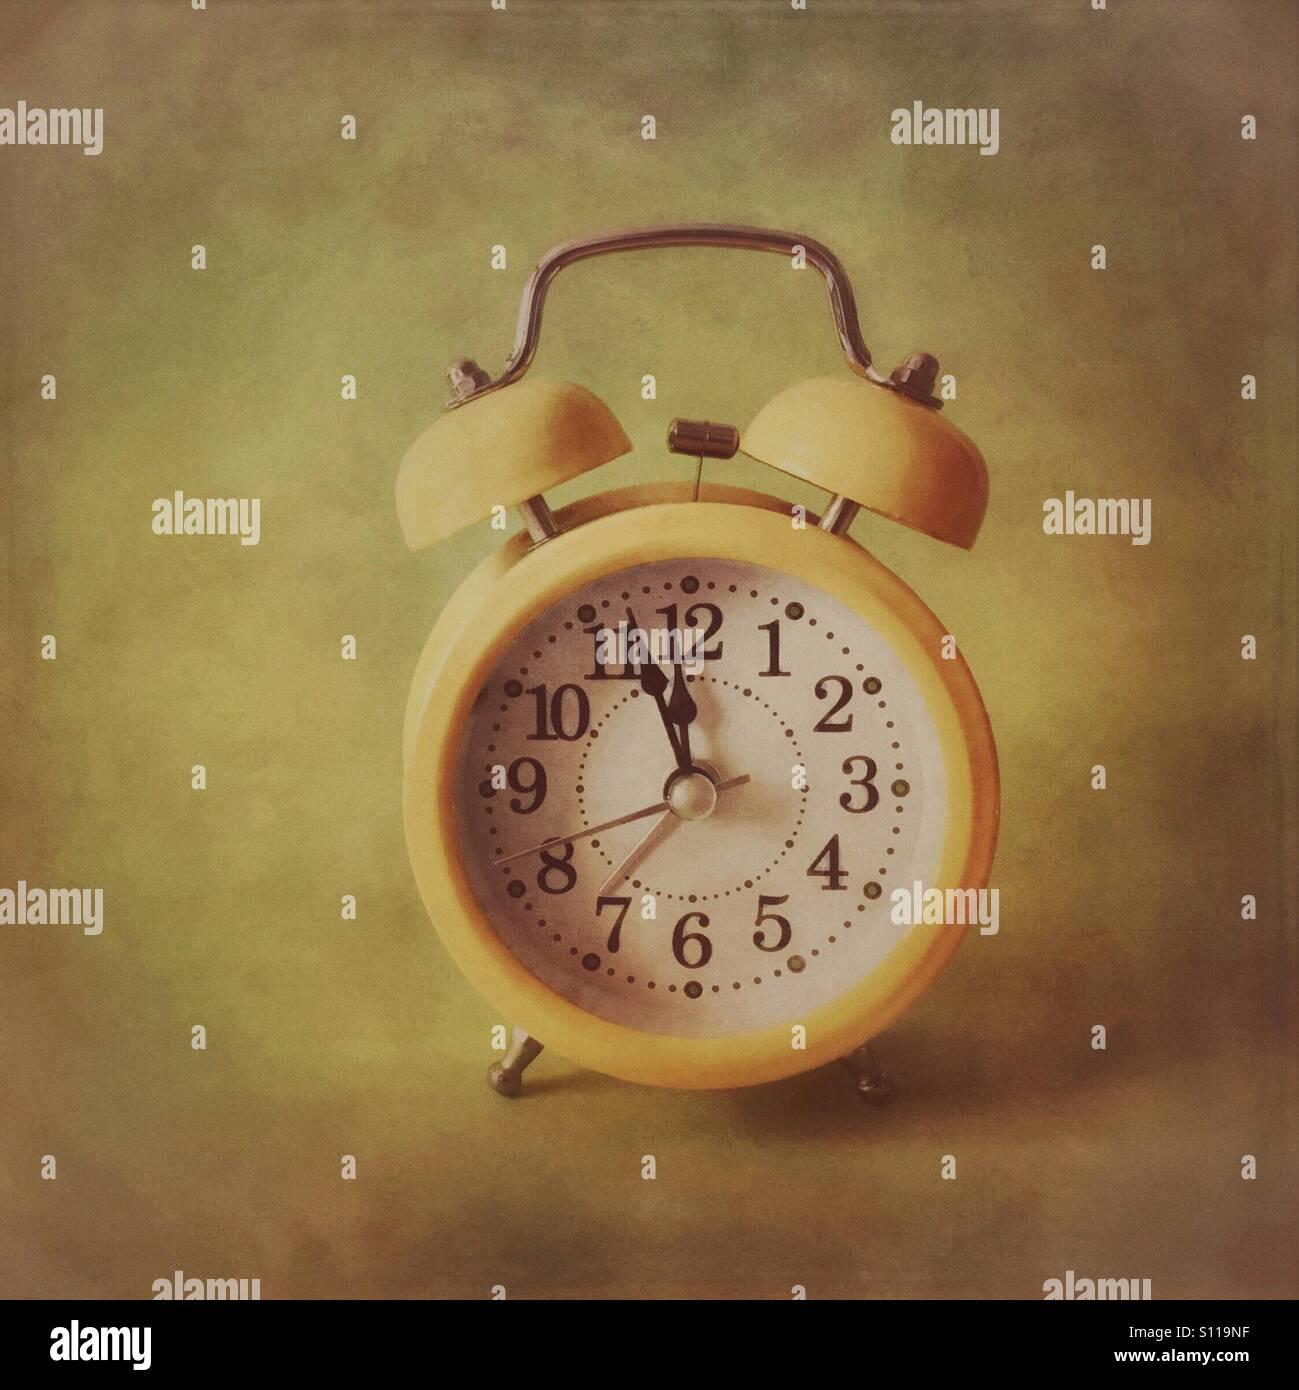 Retro alarm clock - three minutes to midnight - Stock Image